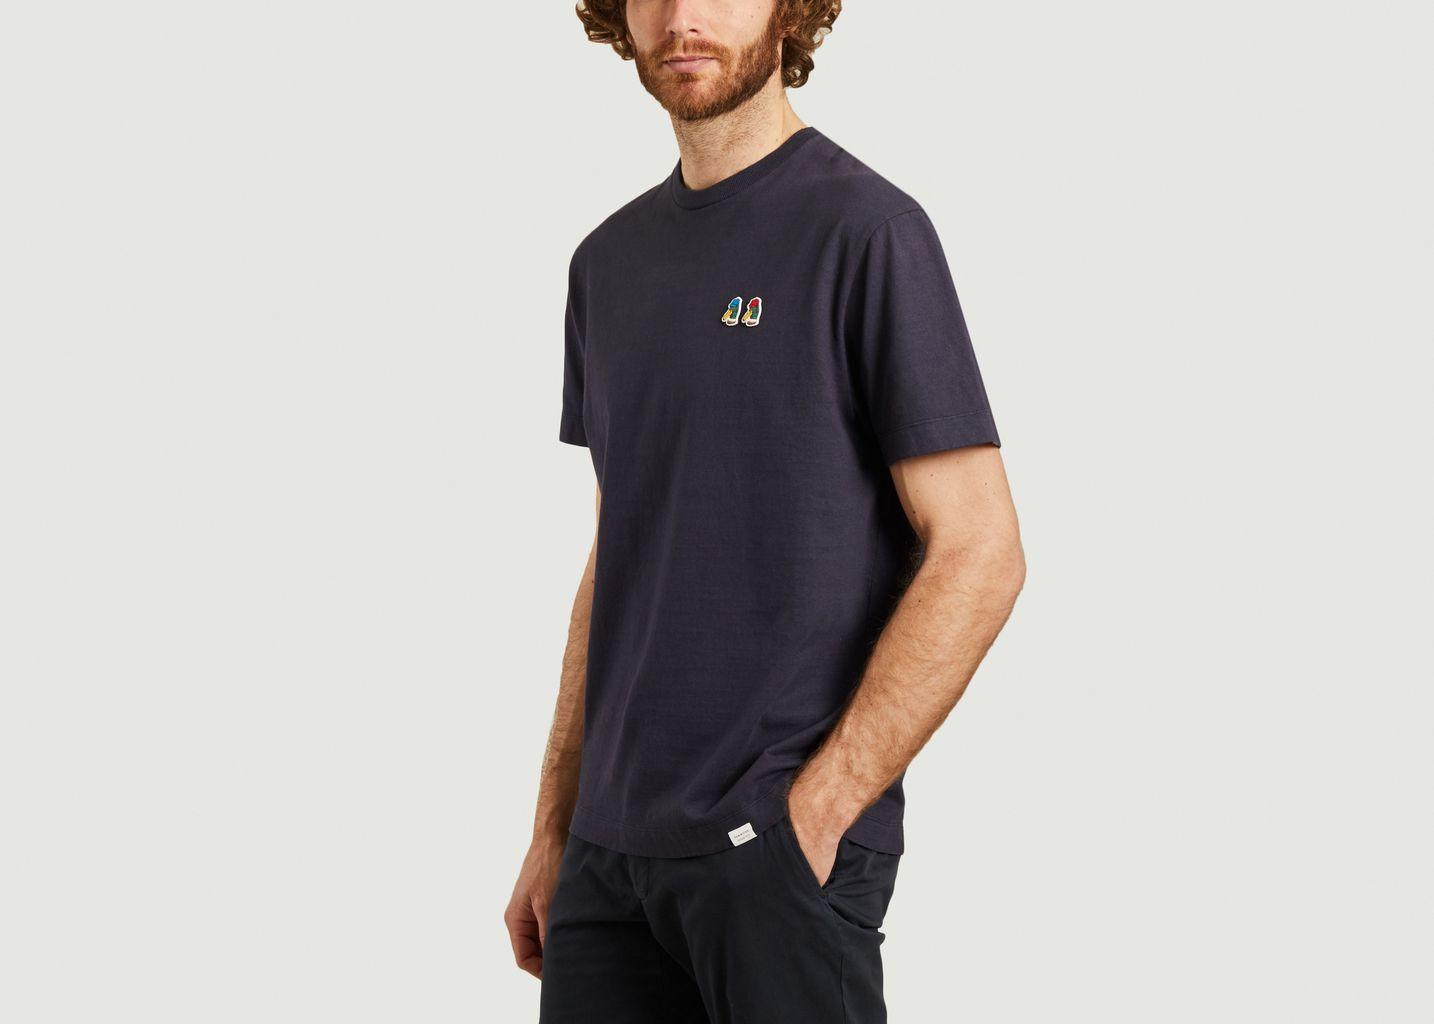 T-shirt Deux Canards - Edmmond Studios